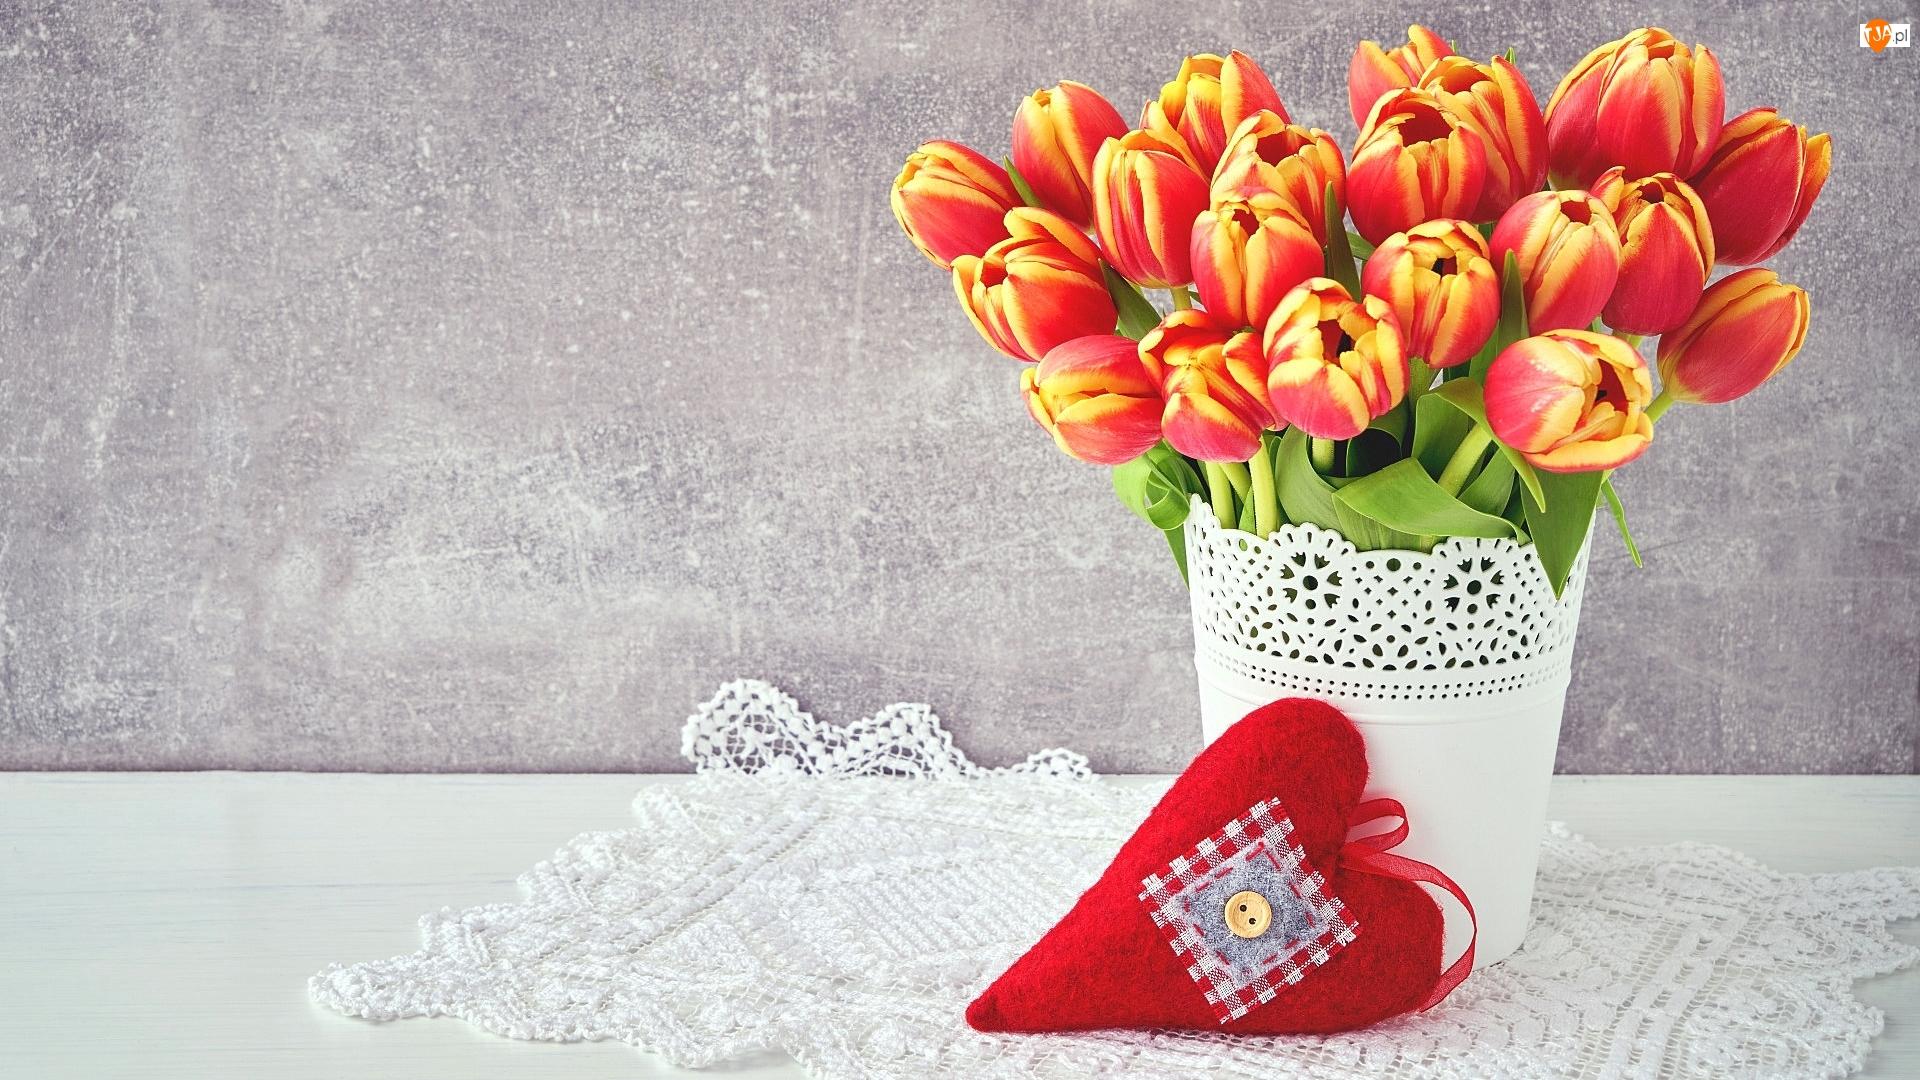 Serwetka, Tulipany, Doniczka, Serce